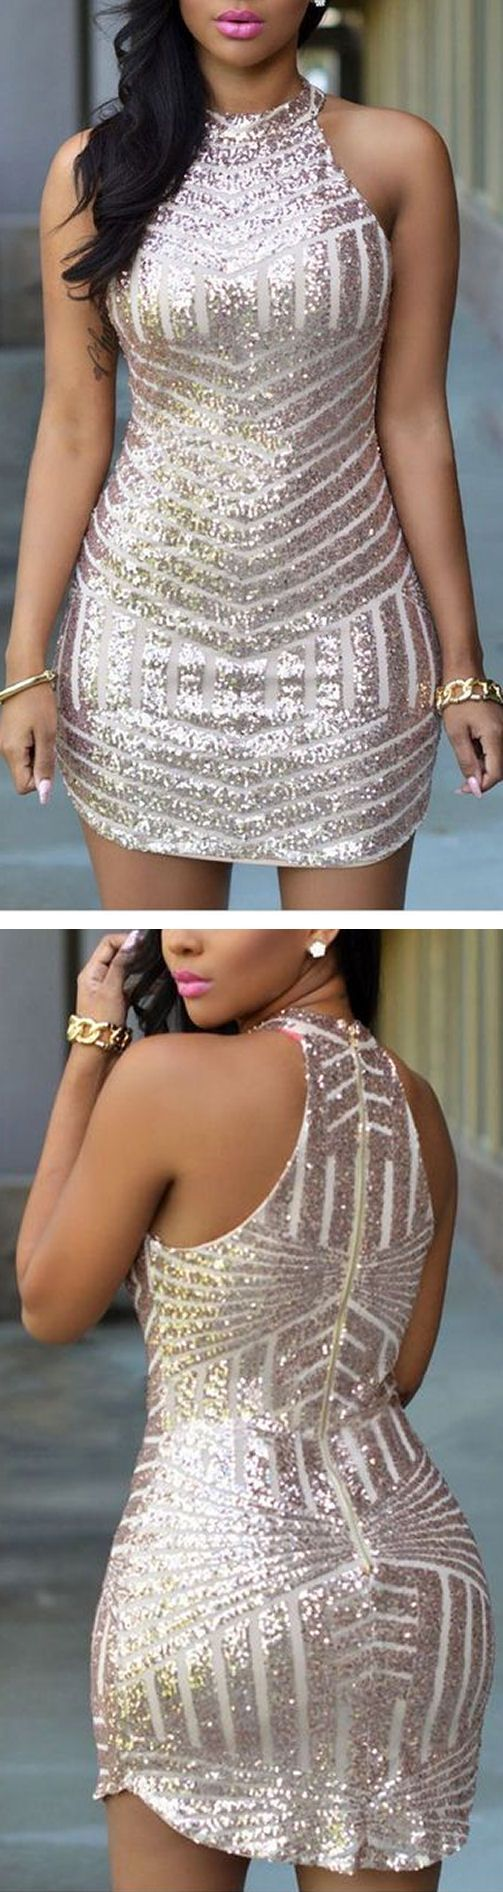 Sequin Stripe Bodycon Dress